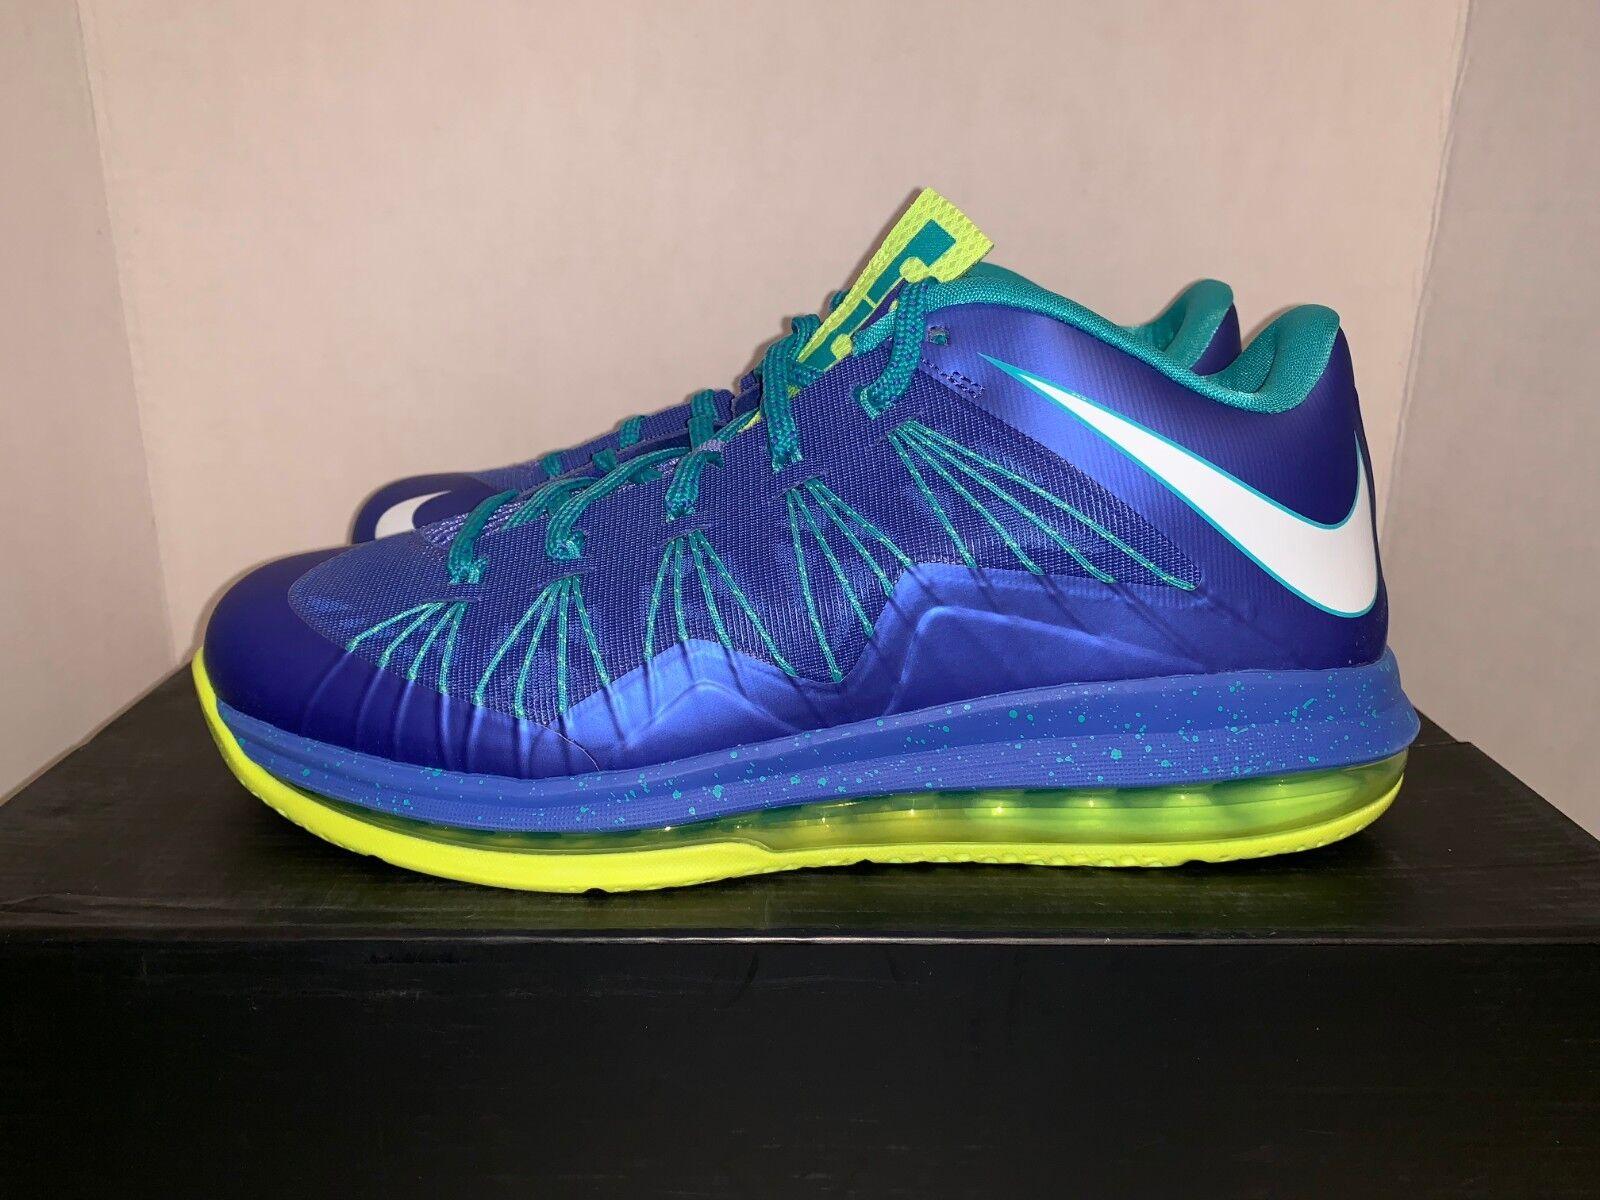 279690c31af Nike Air Max Lebron X Low Sprite Volt Platinum Size 10 2013  579765 ...